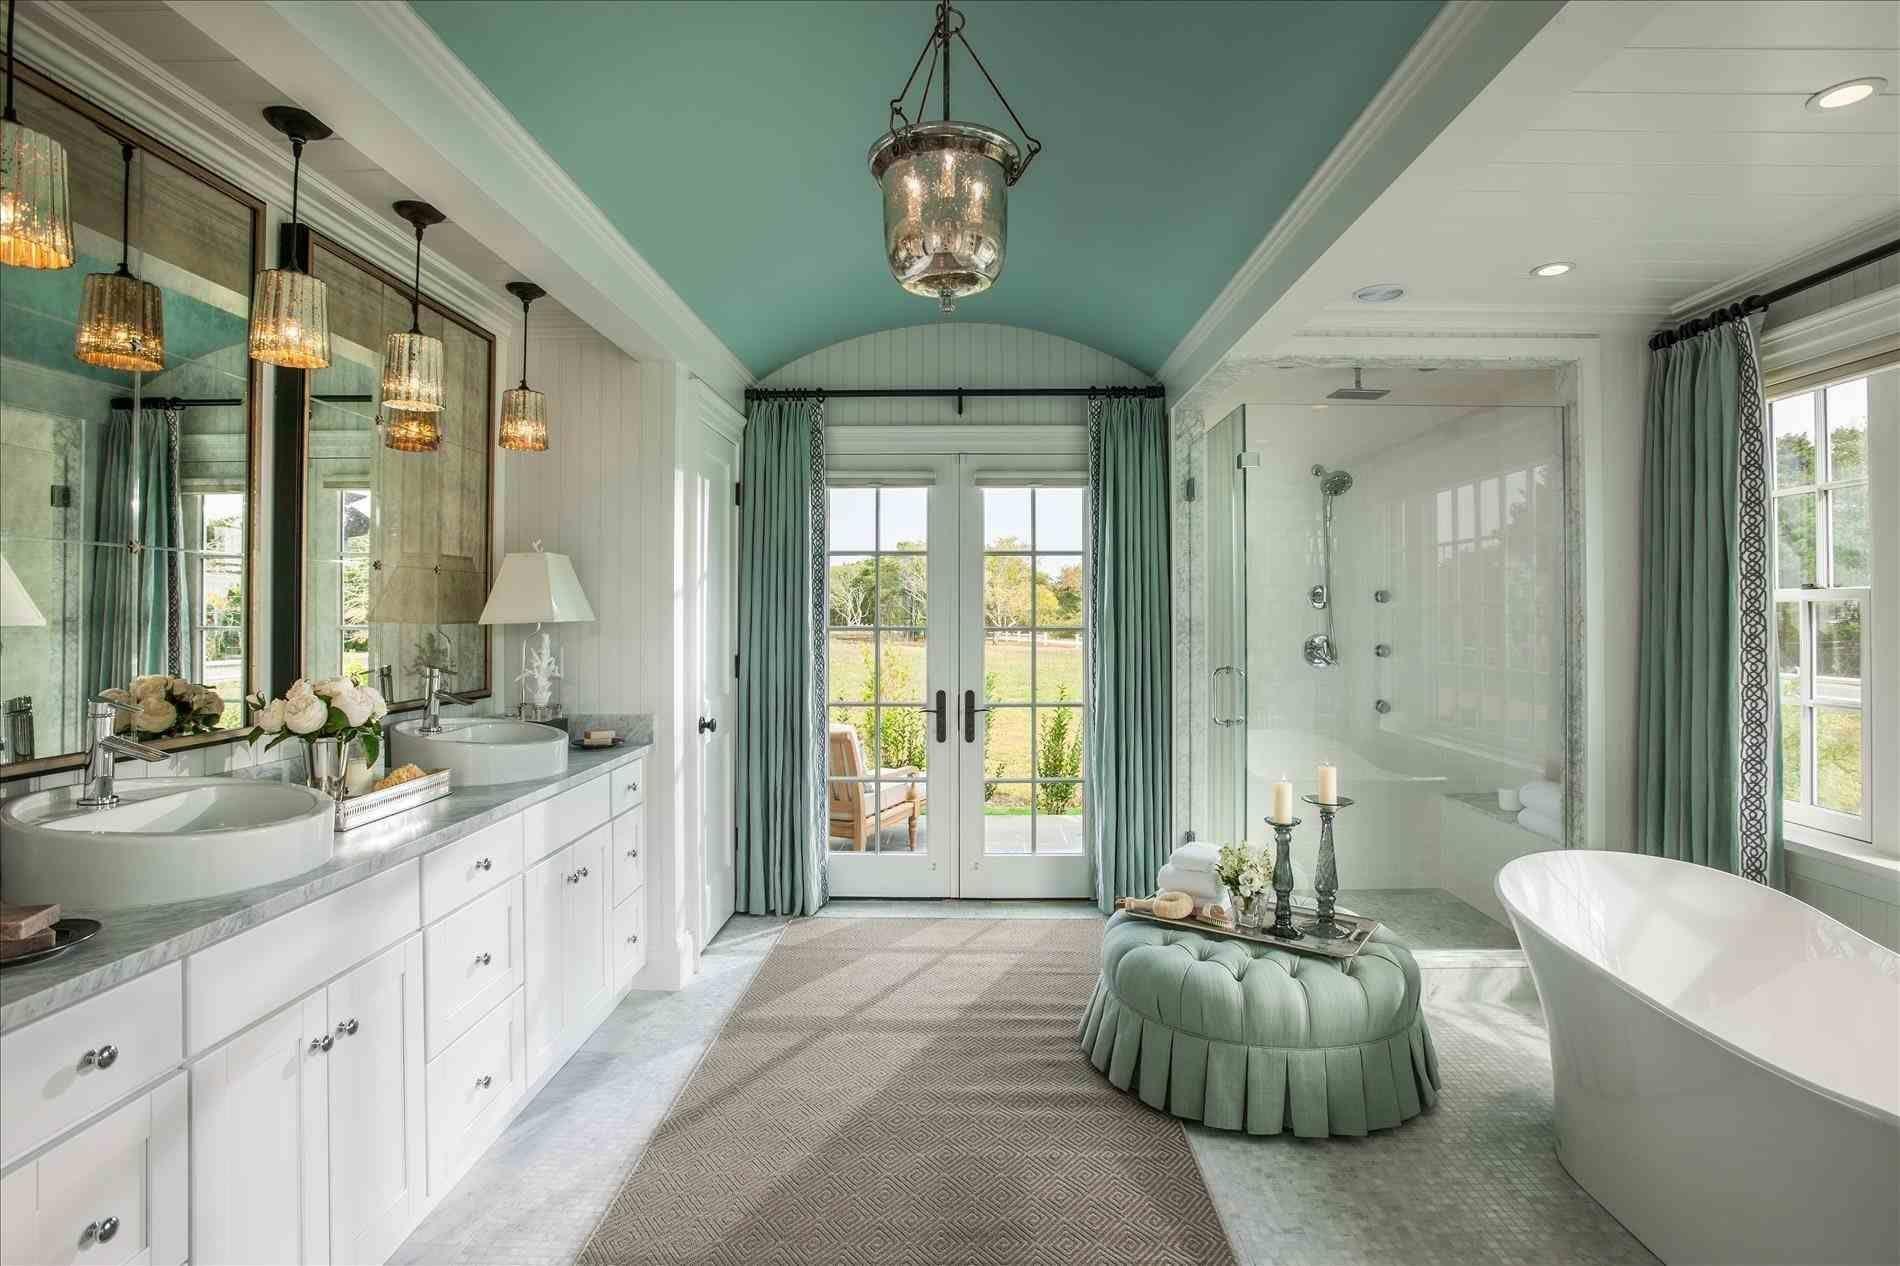 New Post modern master bathroom interior design visit Bobayule